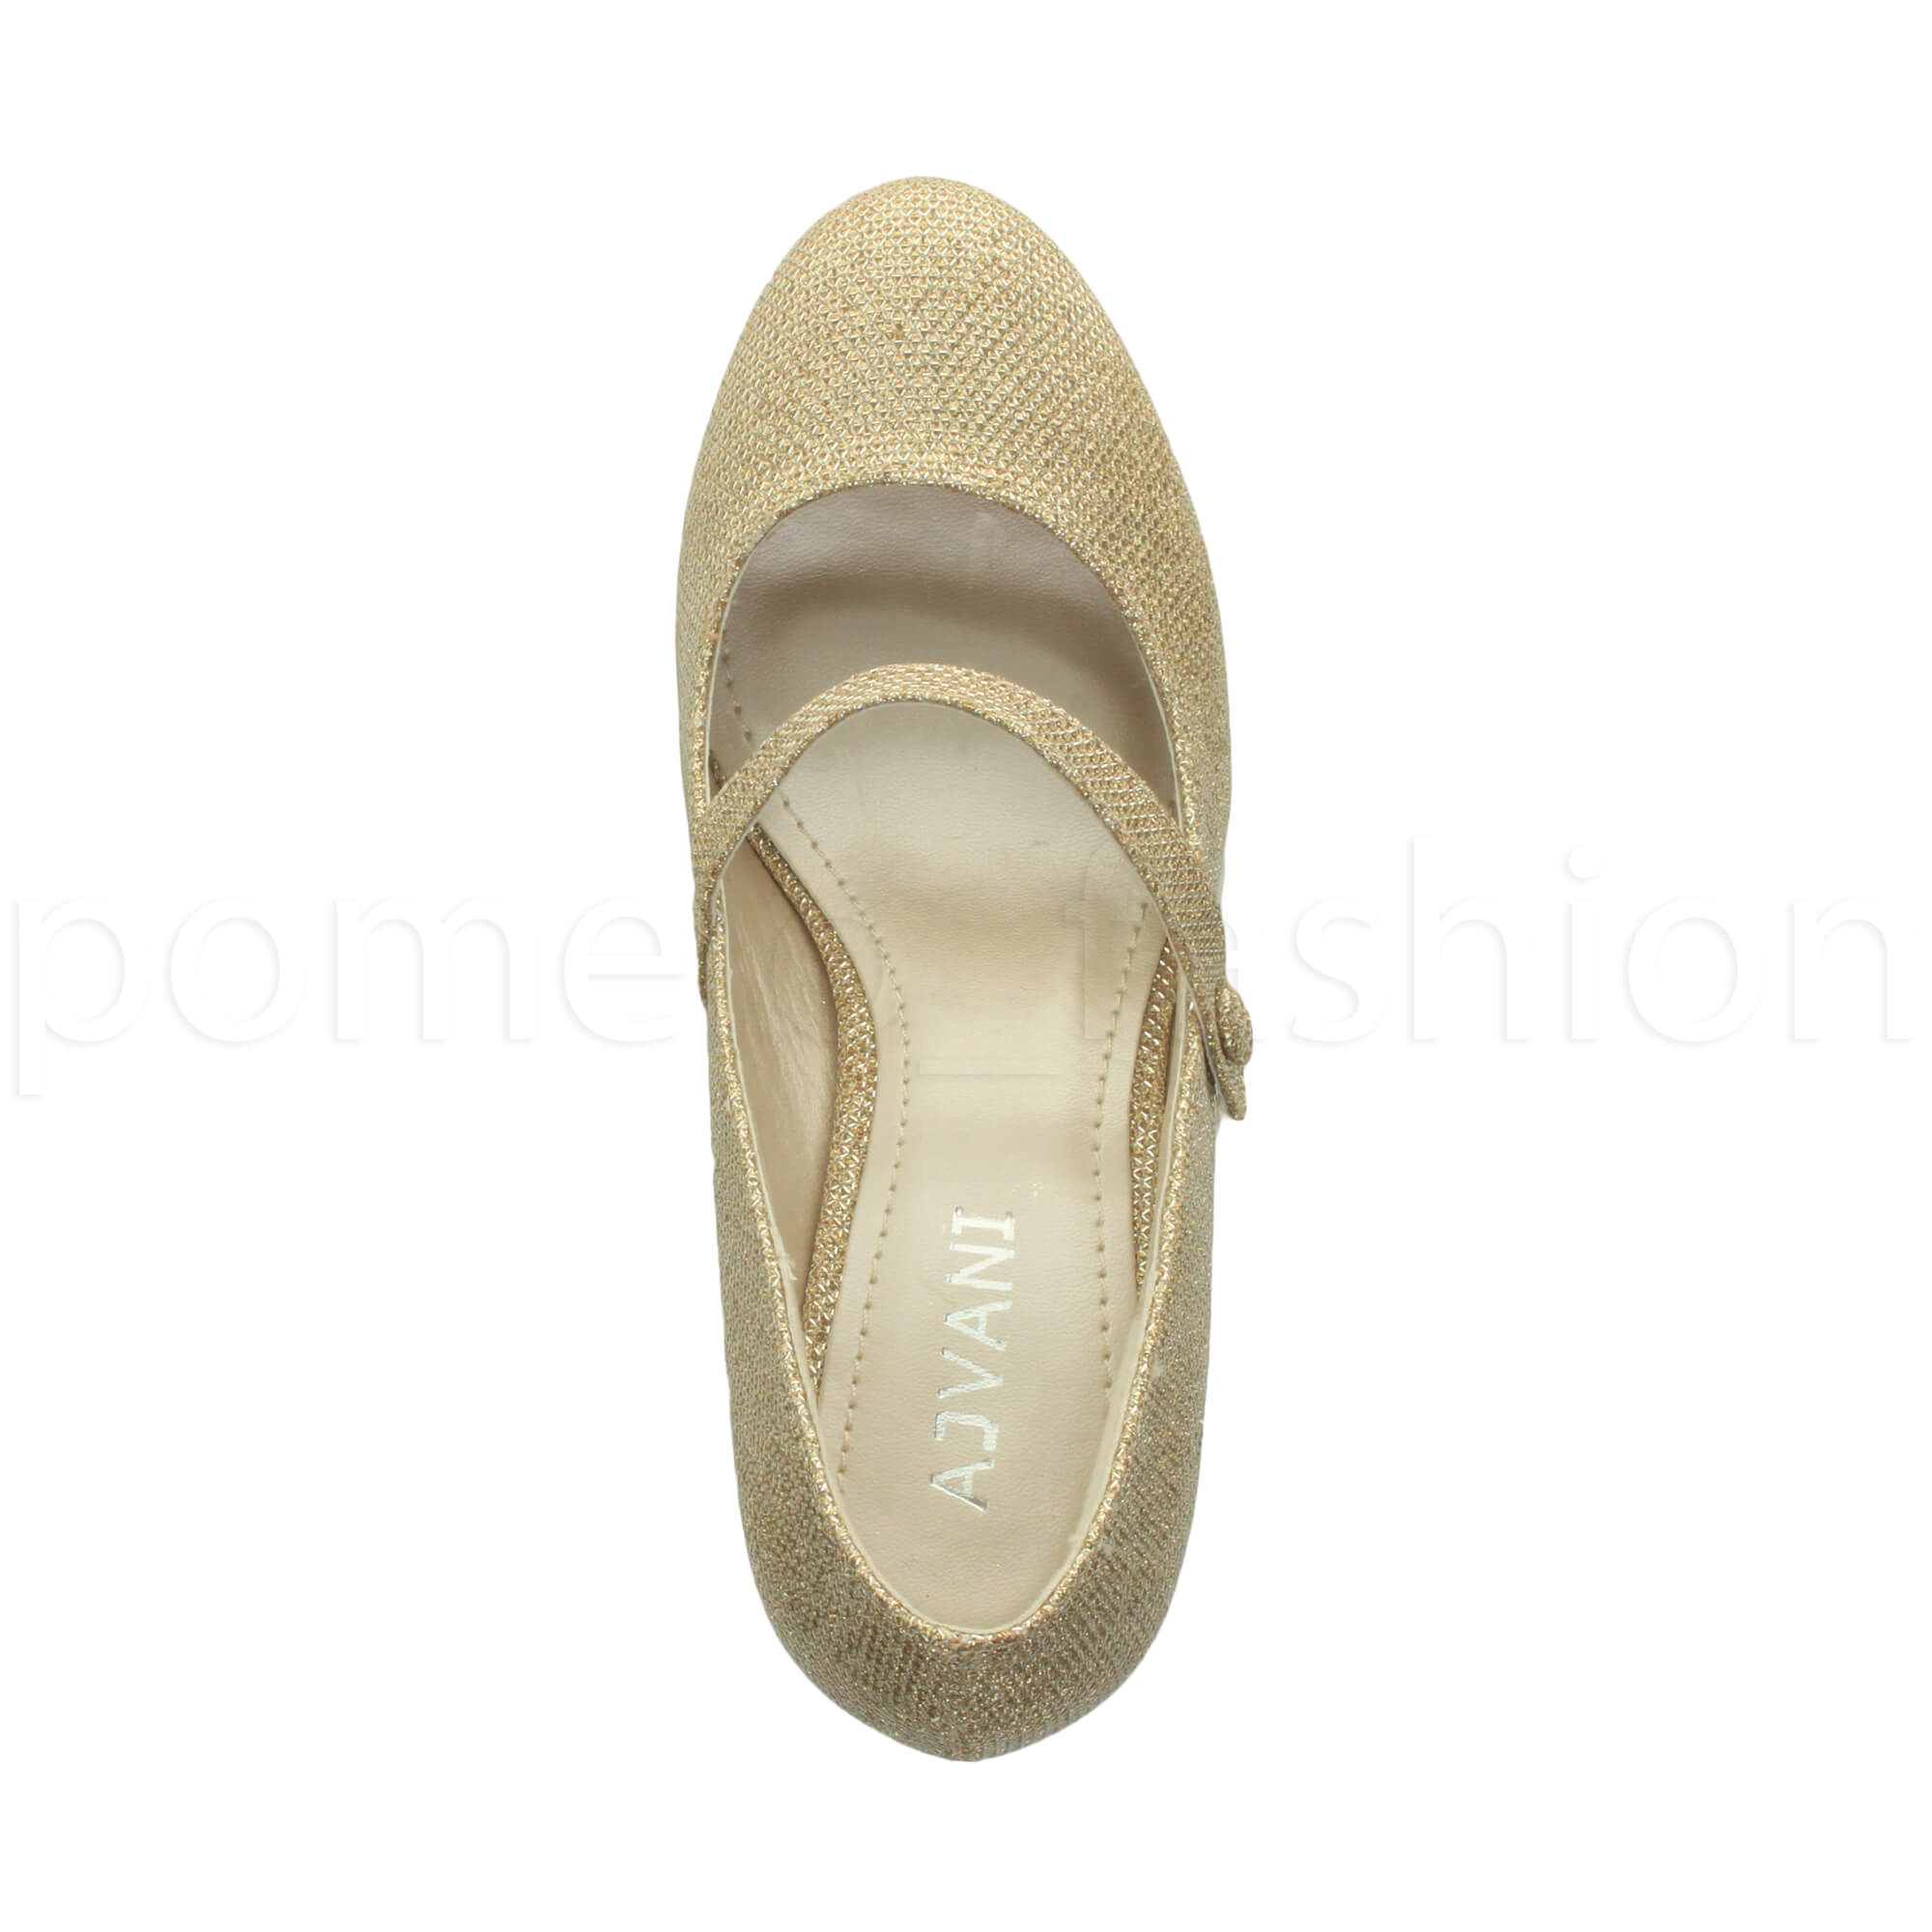 miniatura 77 - Donna basso tacco medio Mary Jane Damigella Matrimonio Pompe Scarpe Da Sera Taglia